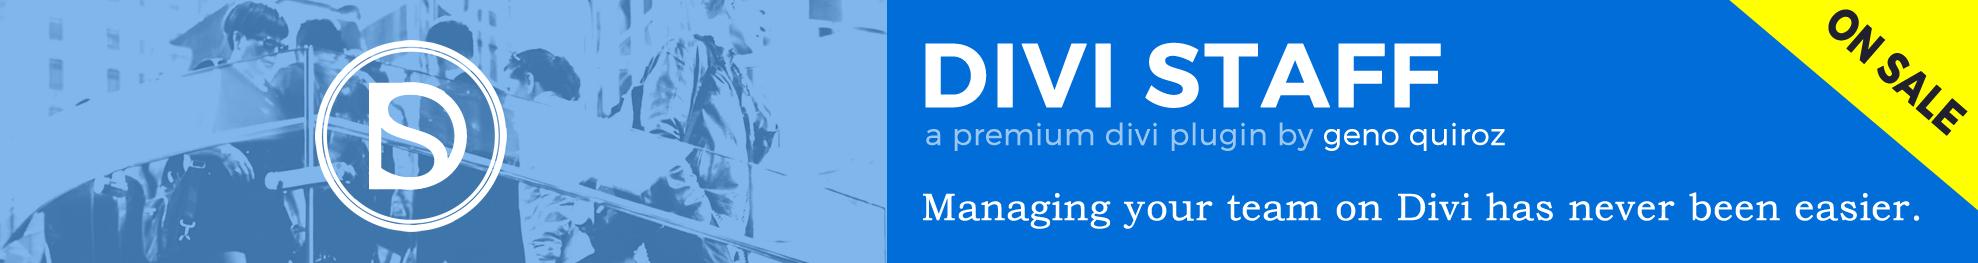 Divi Staff - A Premium Divi Plugin by Geno Quiroz